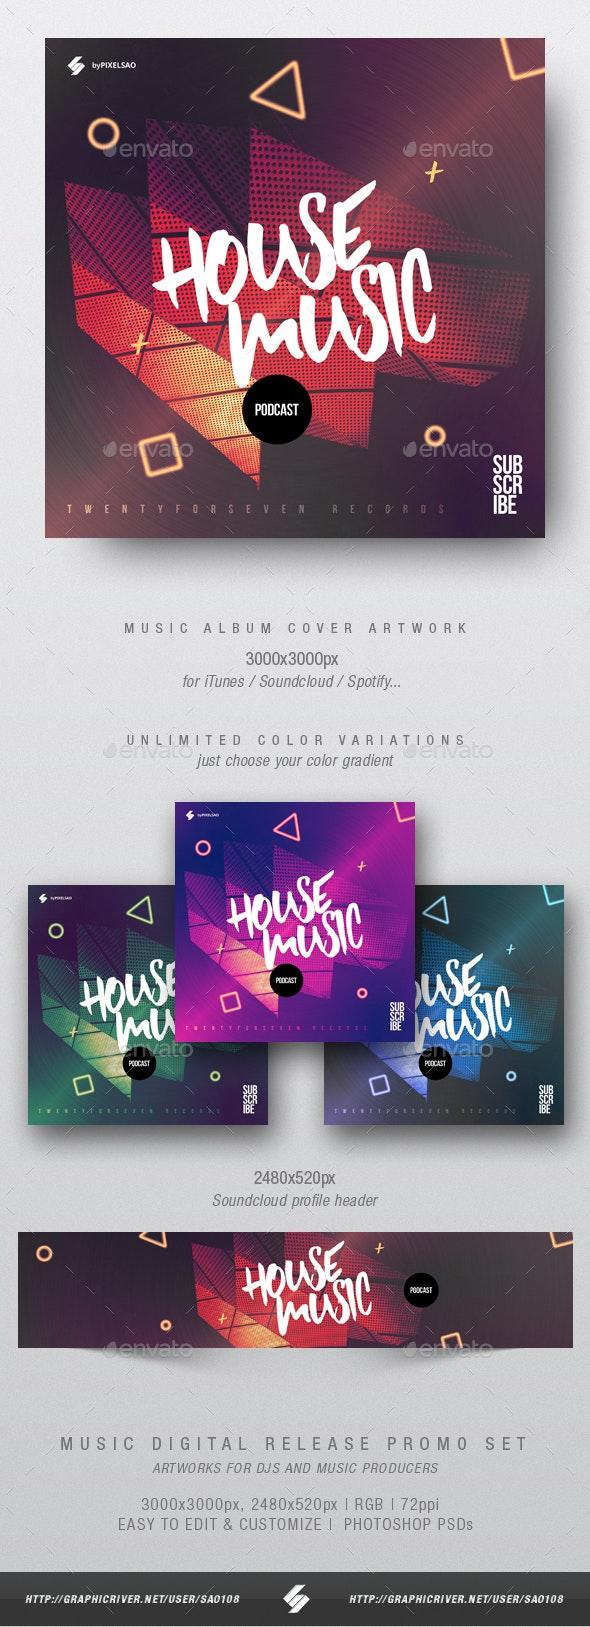 House Music Podcast - Album Cover Artwork Template - Miscellaneous Social Media